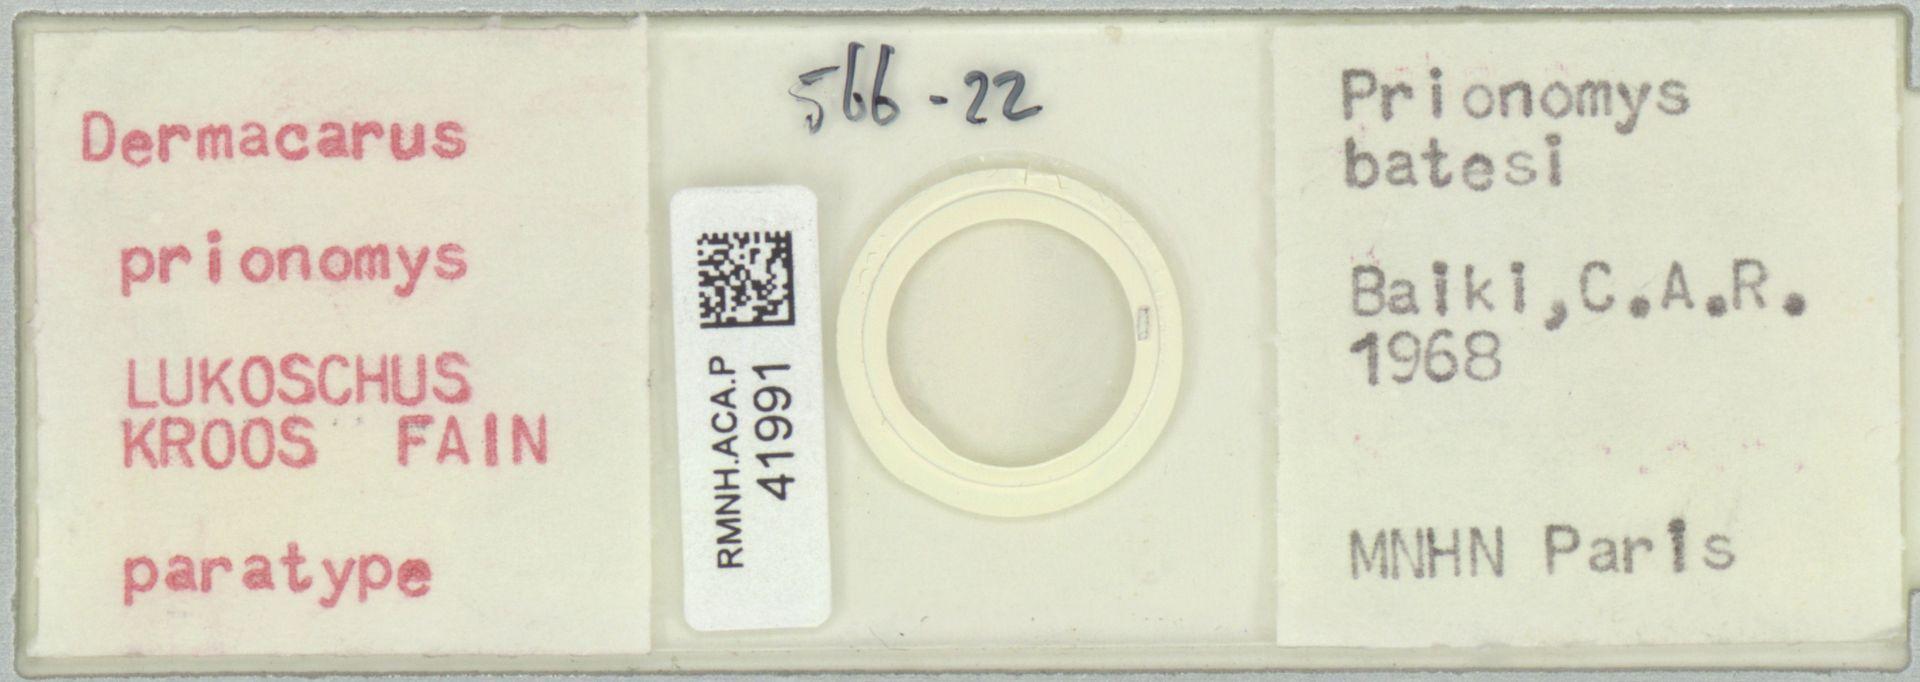 RMNH.ACA.P.41991 | Dermacarus prionomys Lukoschus, Kroos, Fain